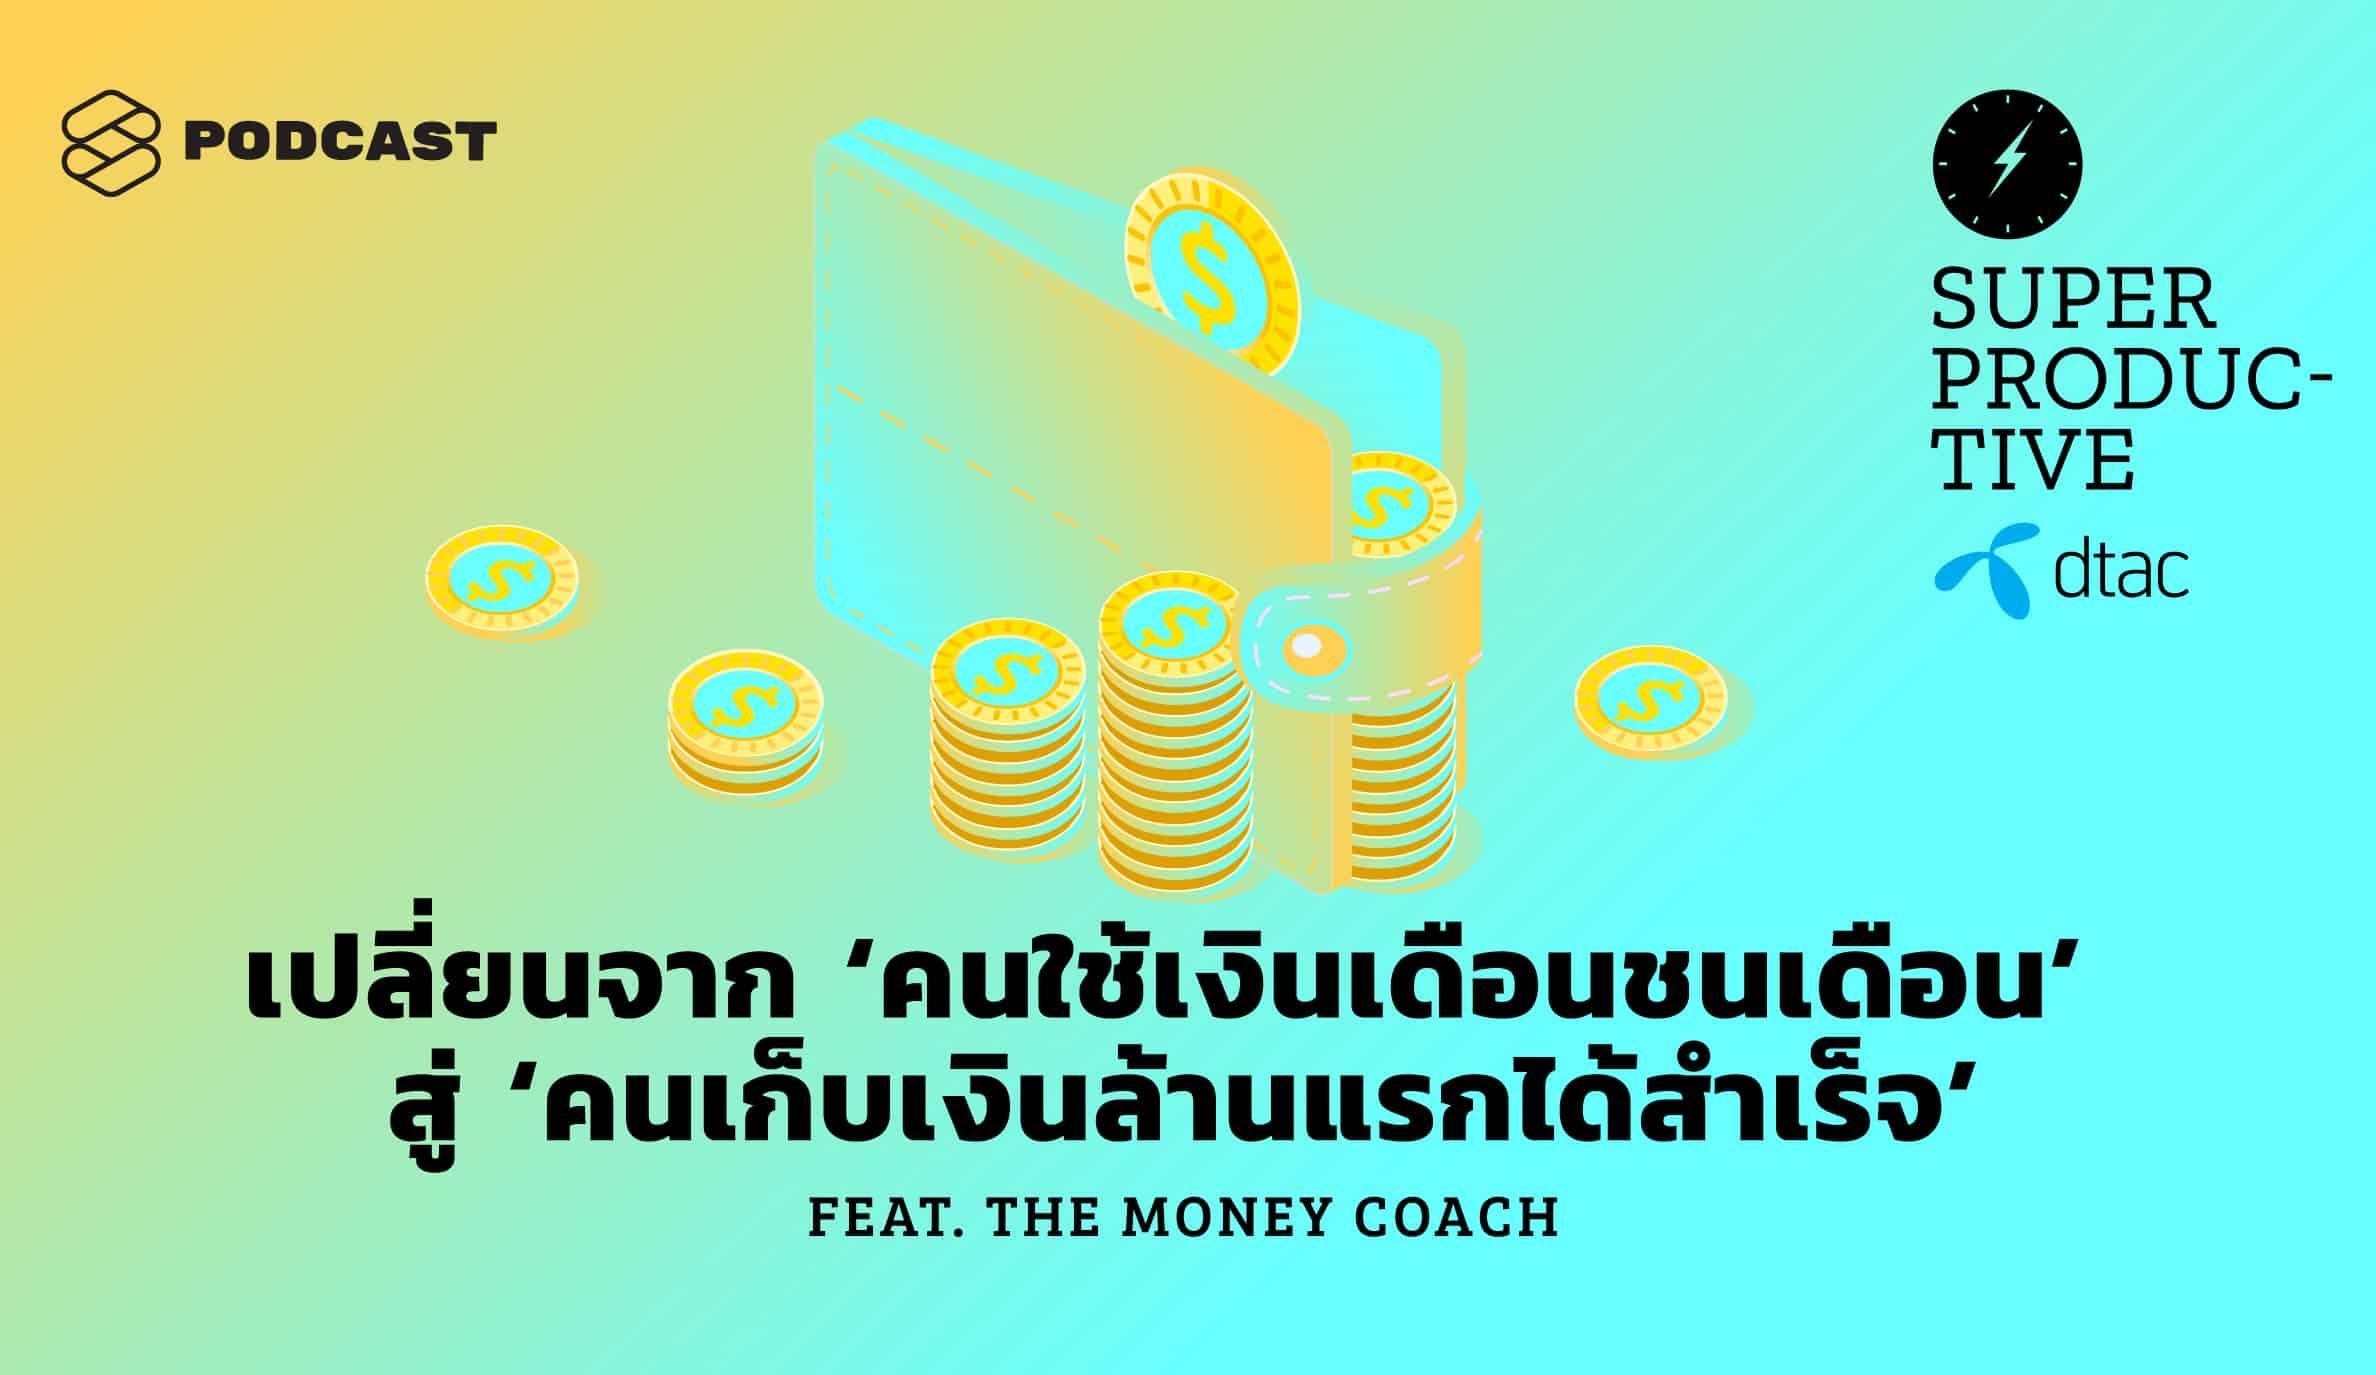 SUPER PRODUCTIVE EP.18 เปลี่ยนตัวเองจาก 'คนใช้เงินเดือนชนเดือน' สู่ 'คนเก็บเงินล้านแรกได้สำเร็จ' Feat. The Money Coach